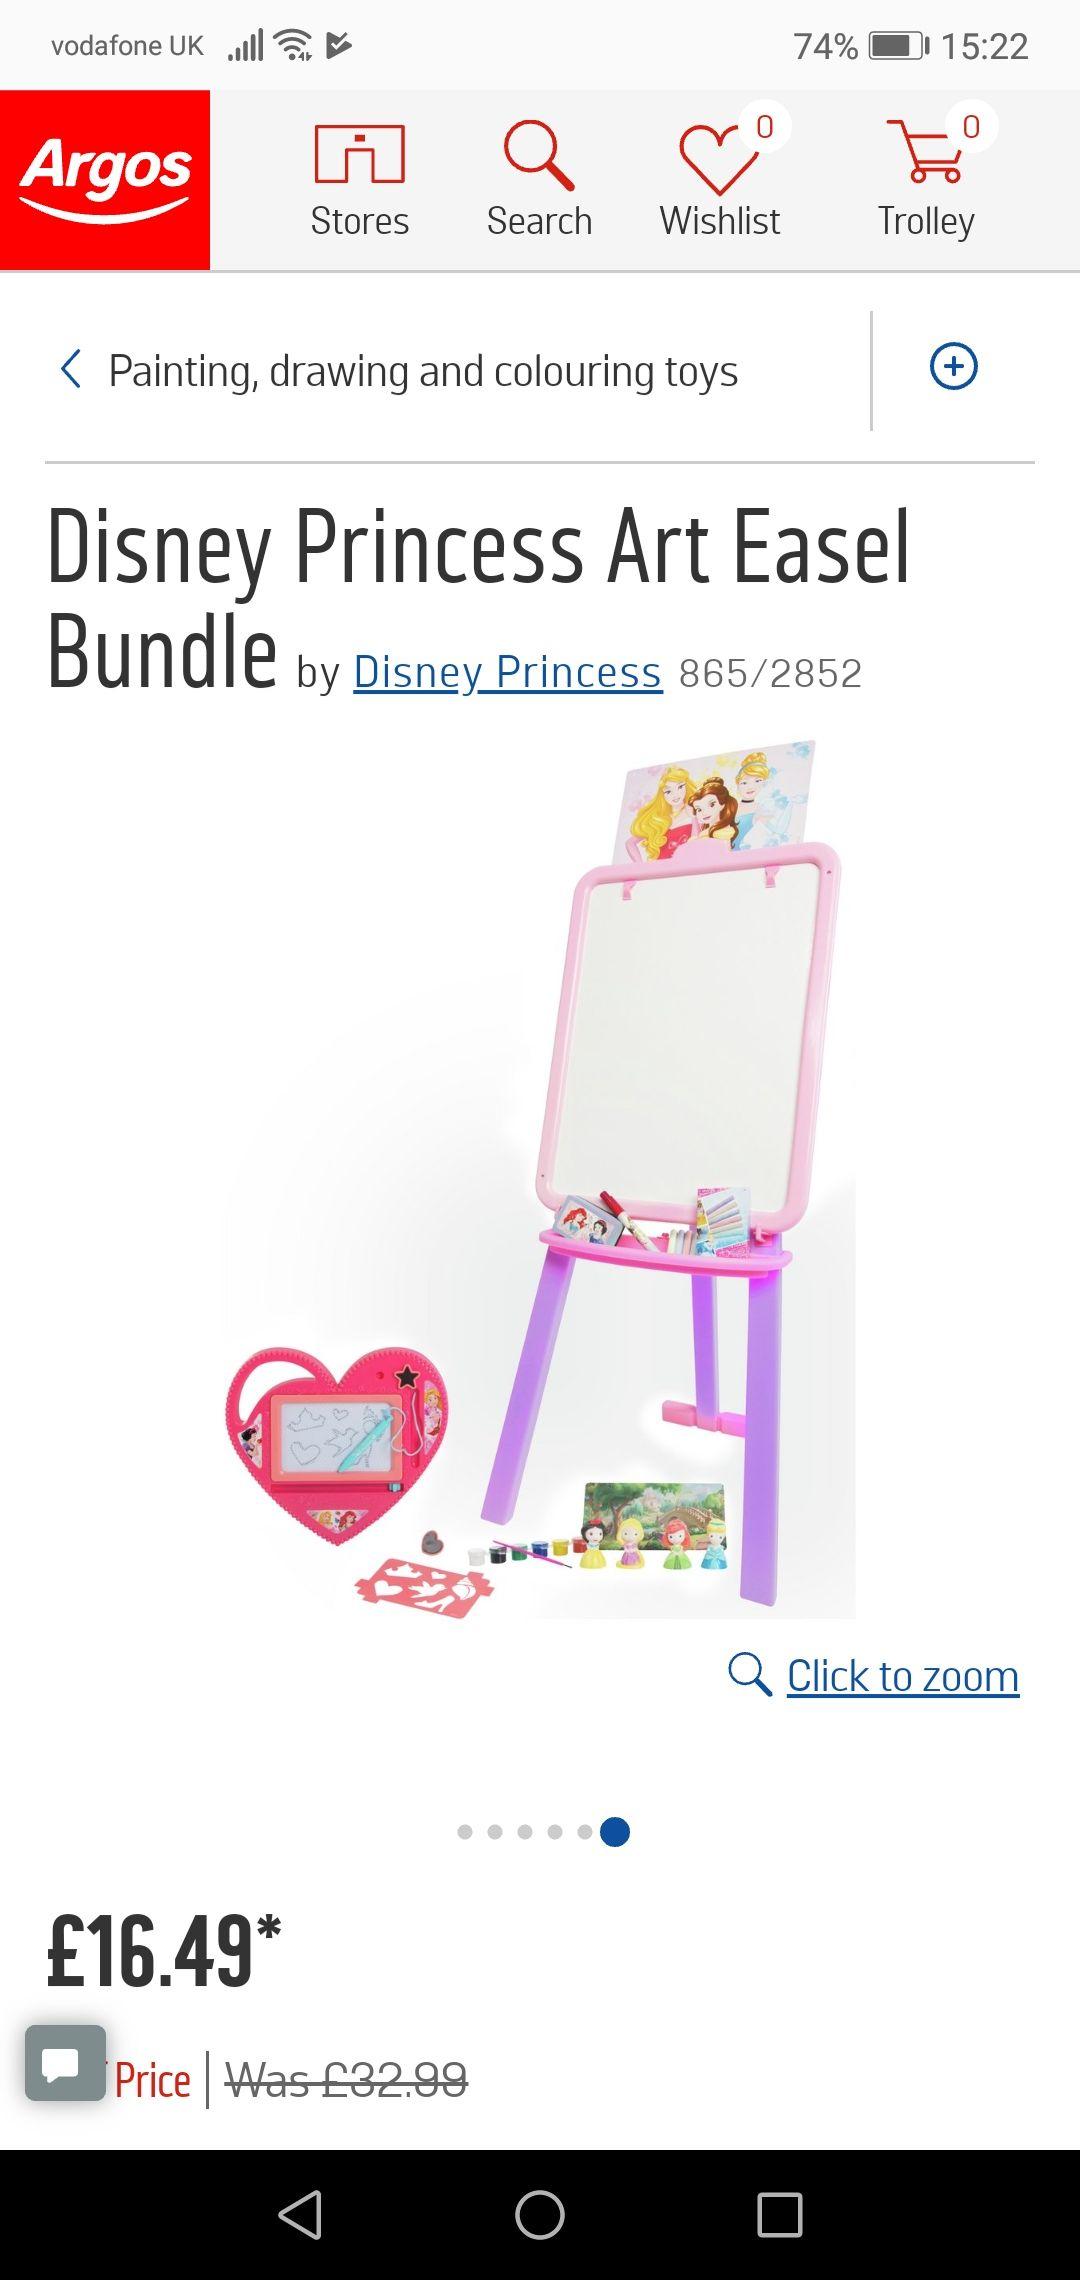 Disney Princess Art Easel Bundle £16.49 @ Argos